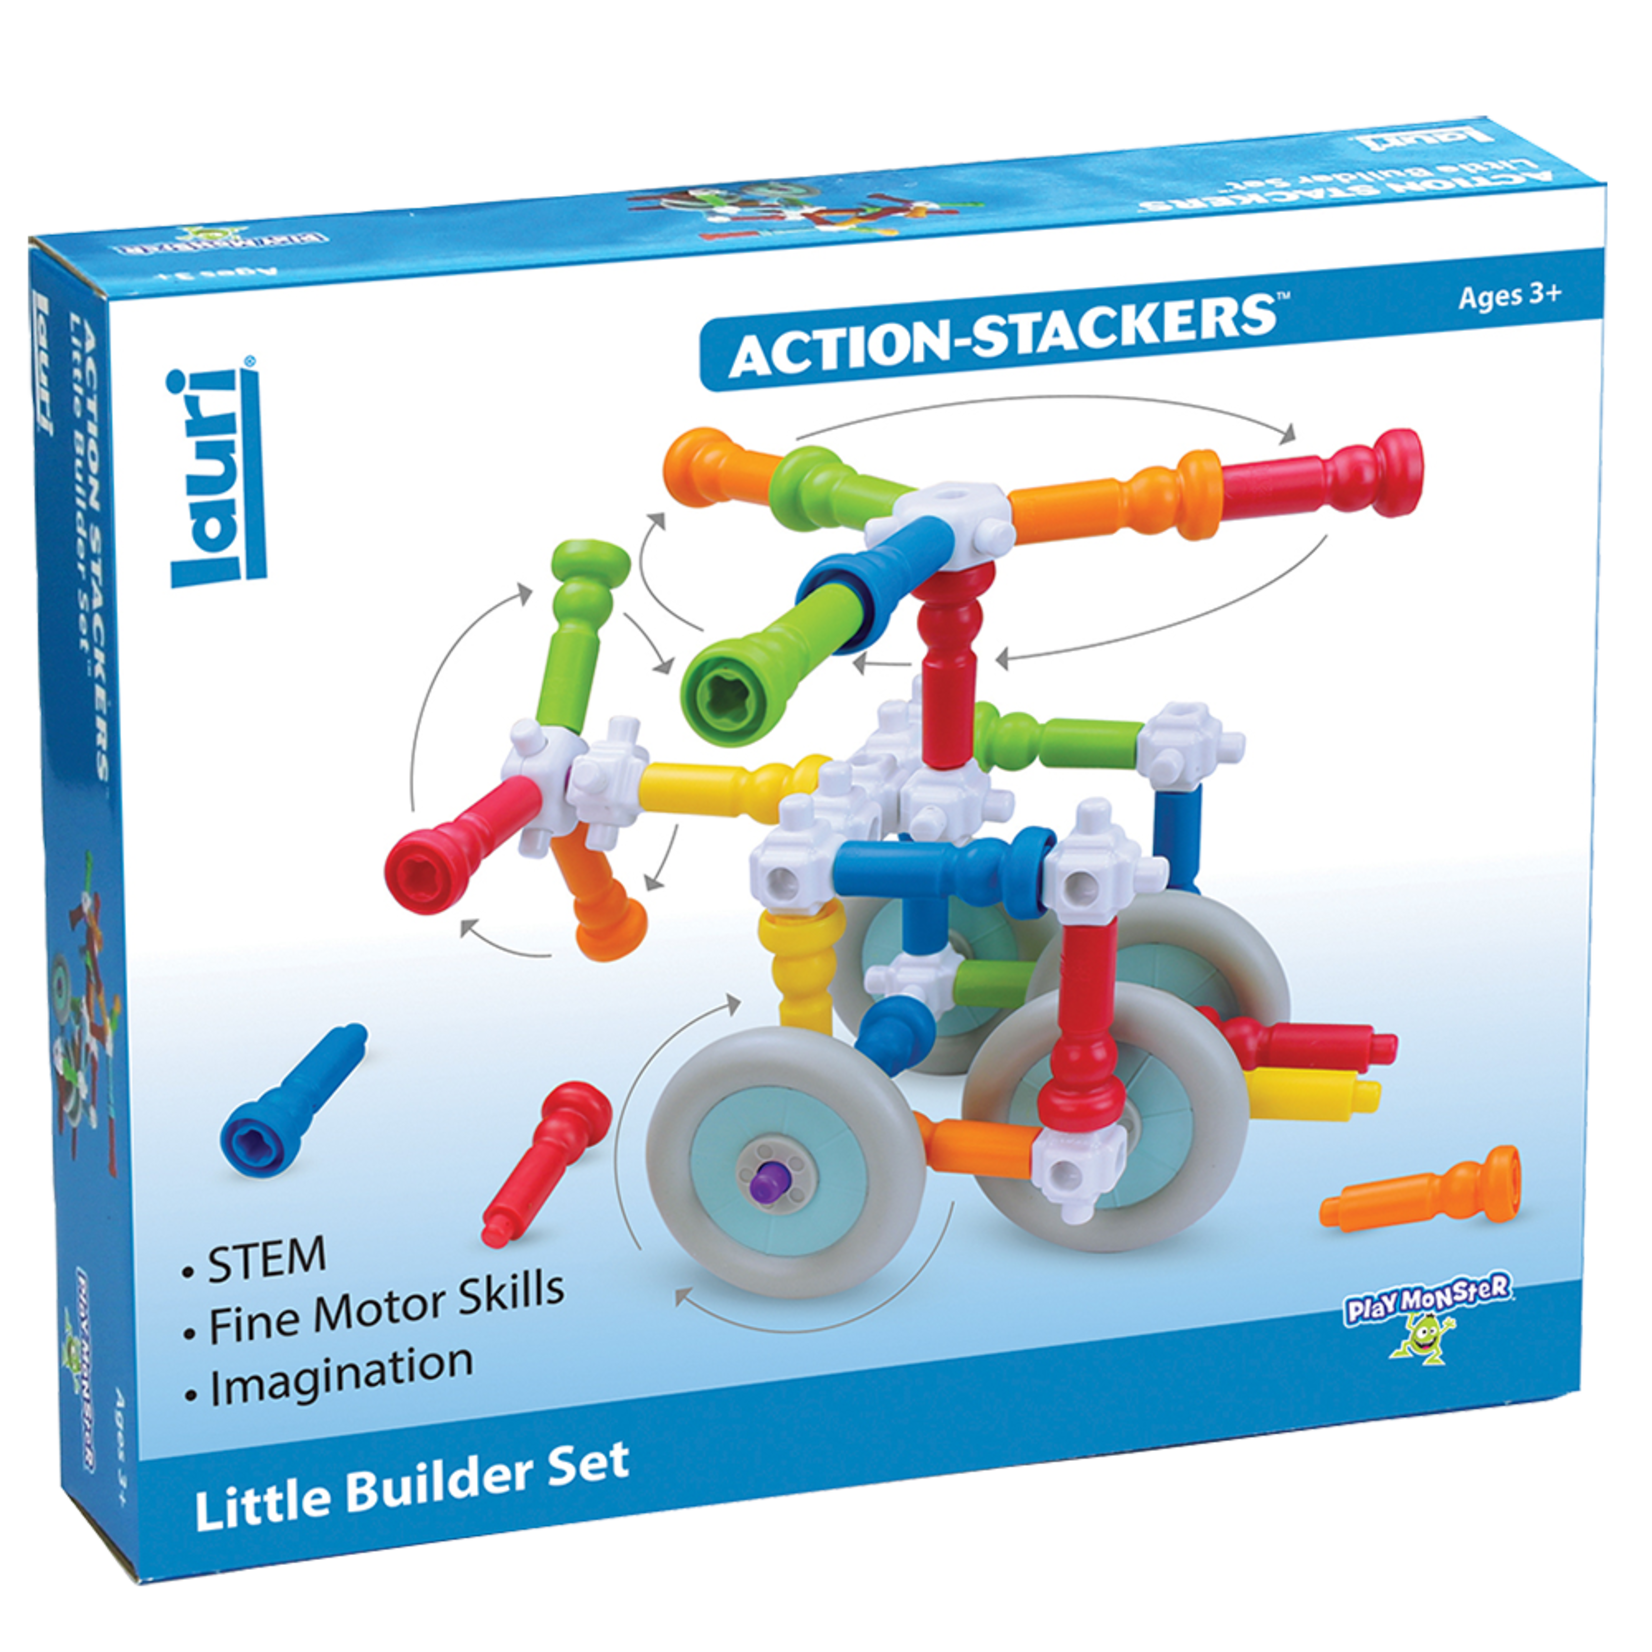 Playmonster Action - Stackers Little Builder Set